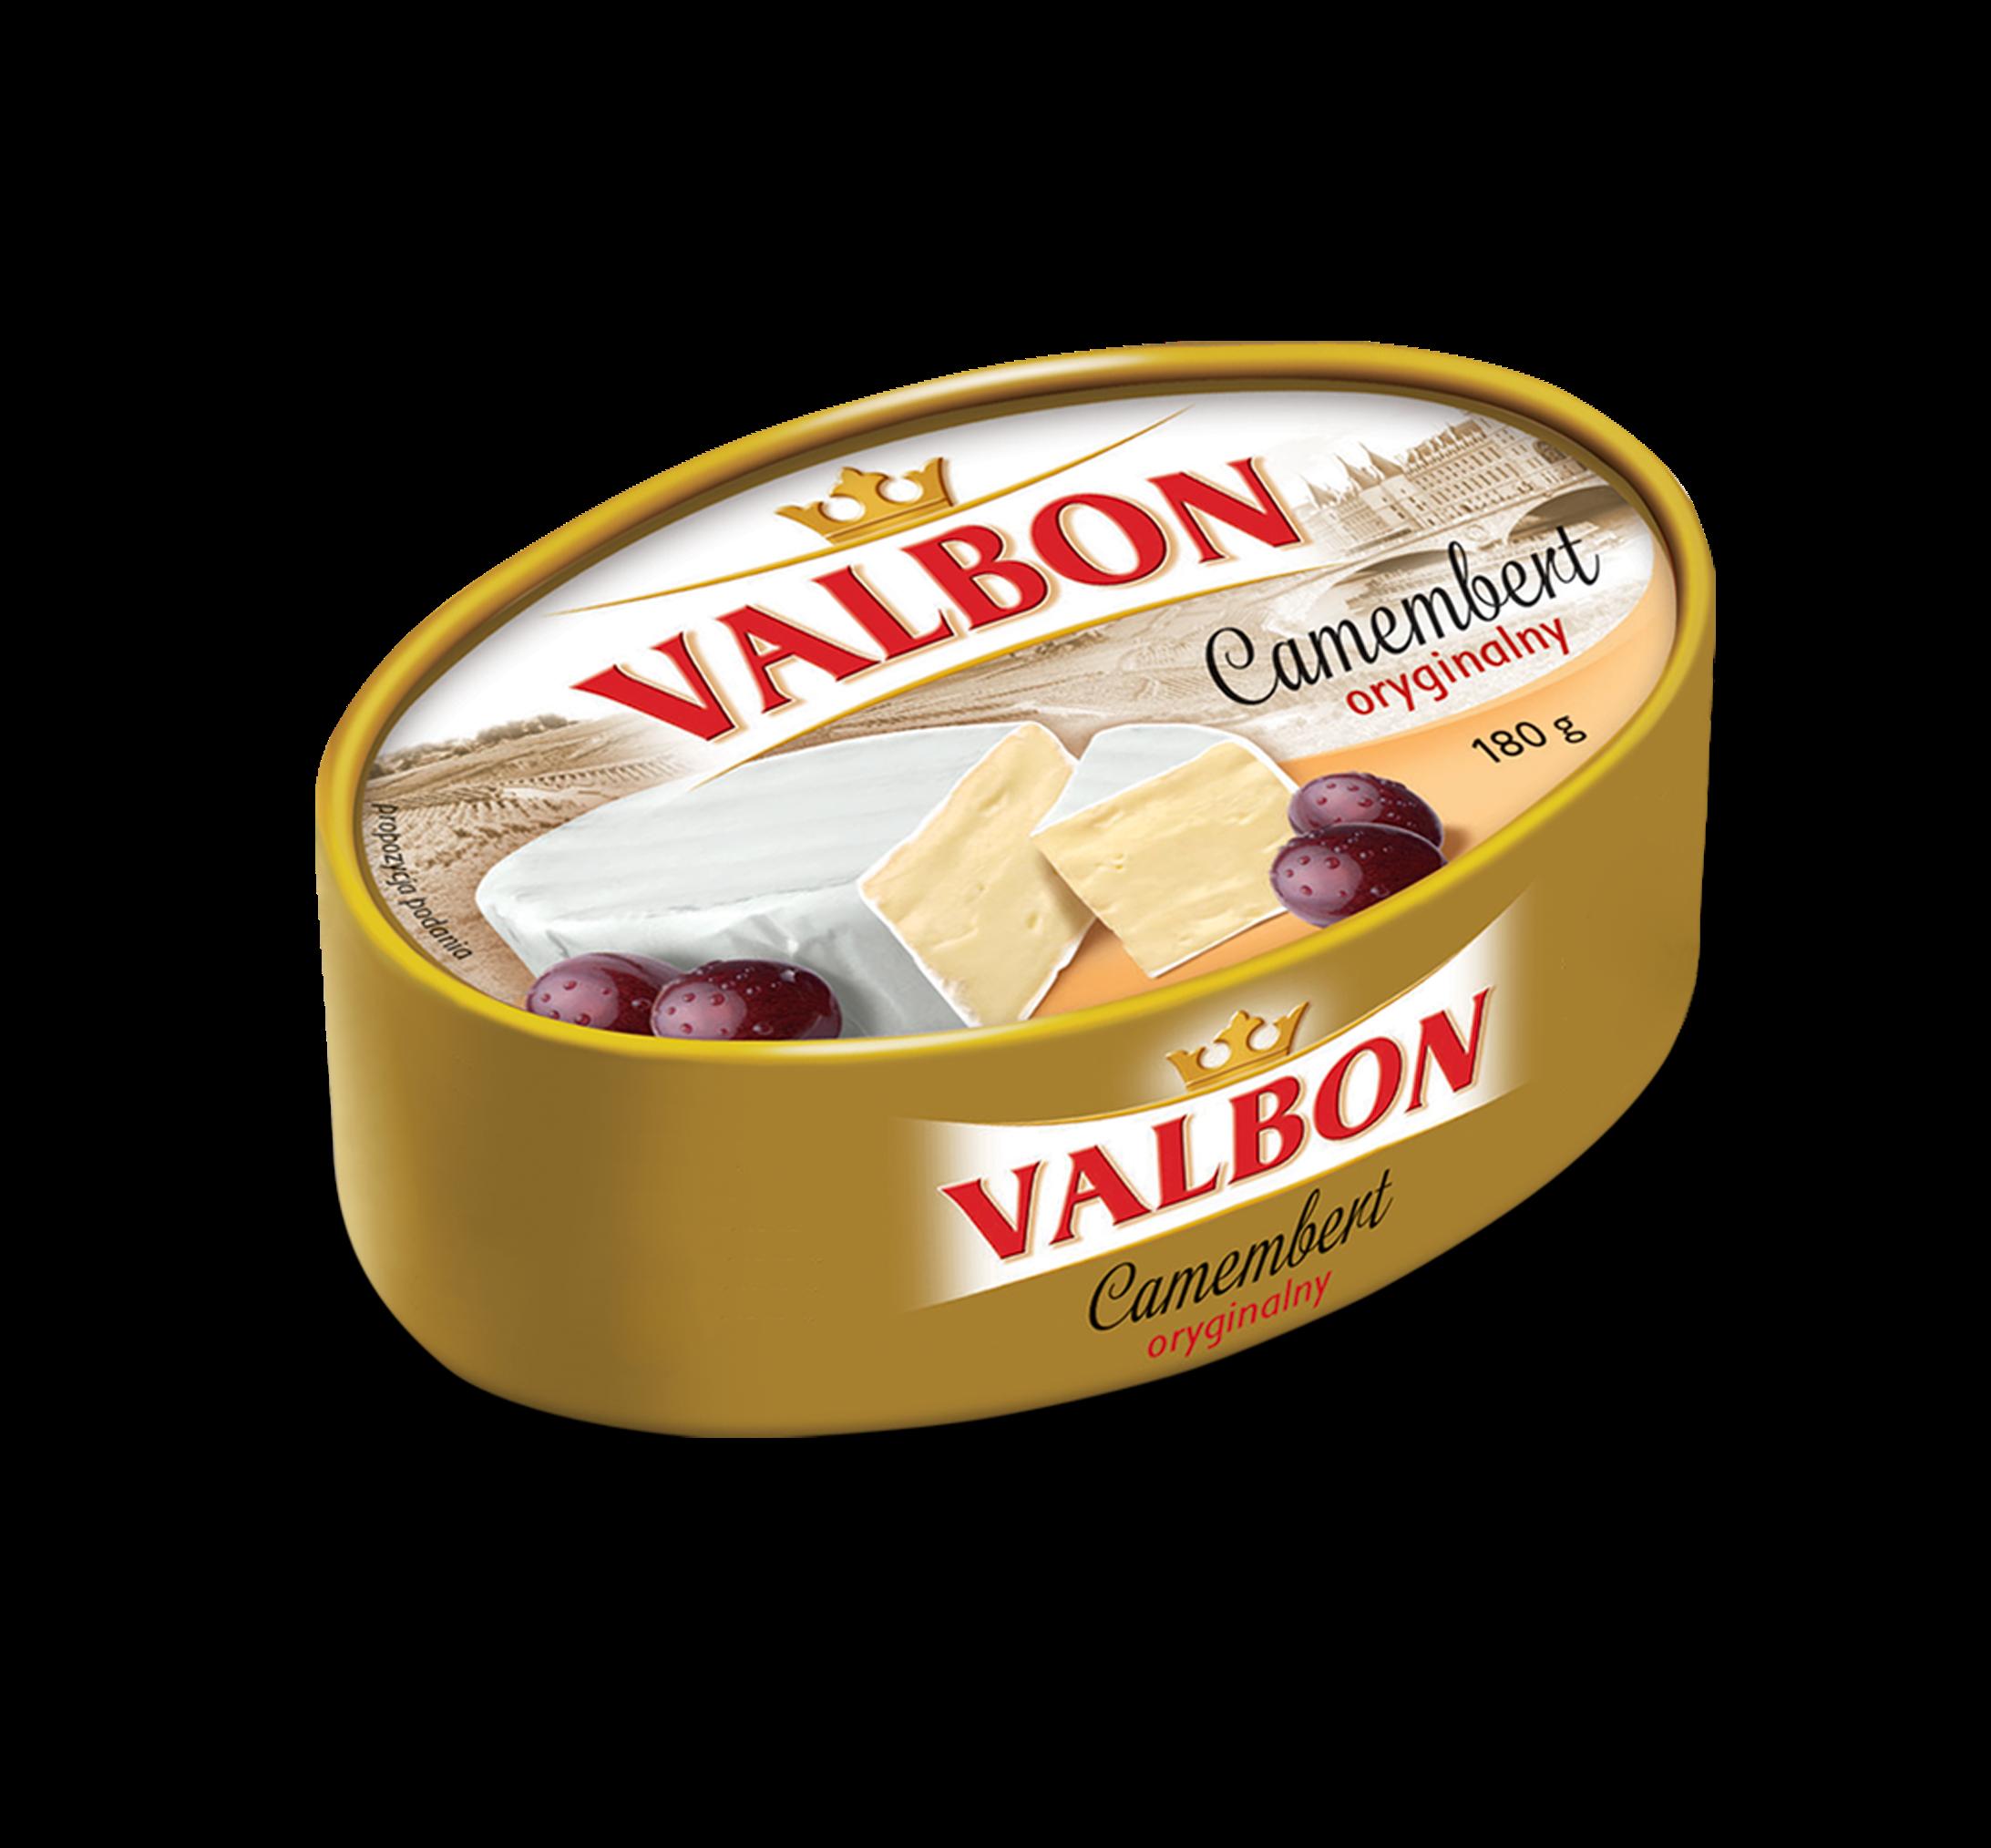 Ser Valbon Camembert oryginalny